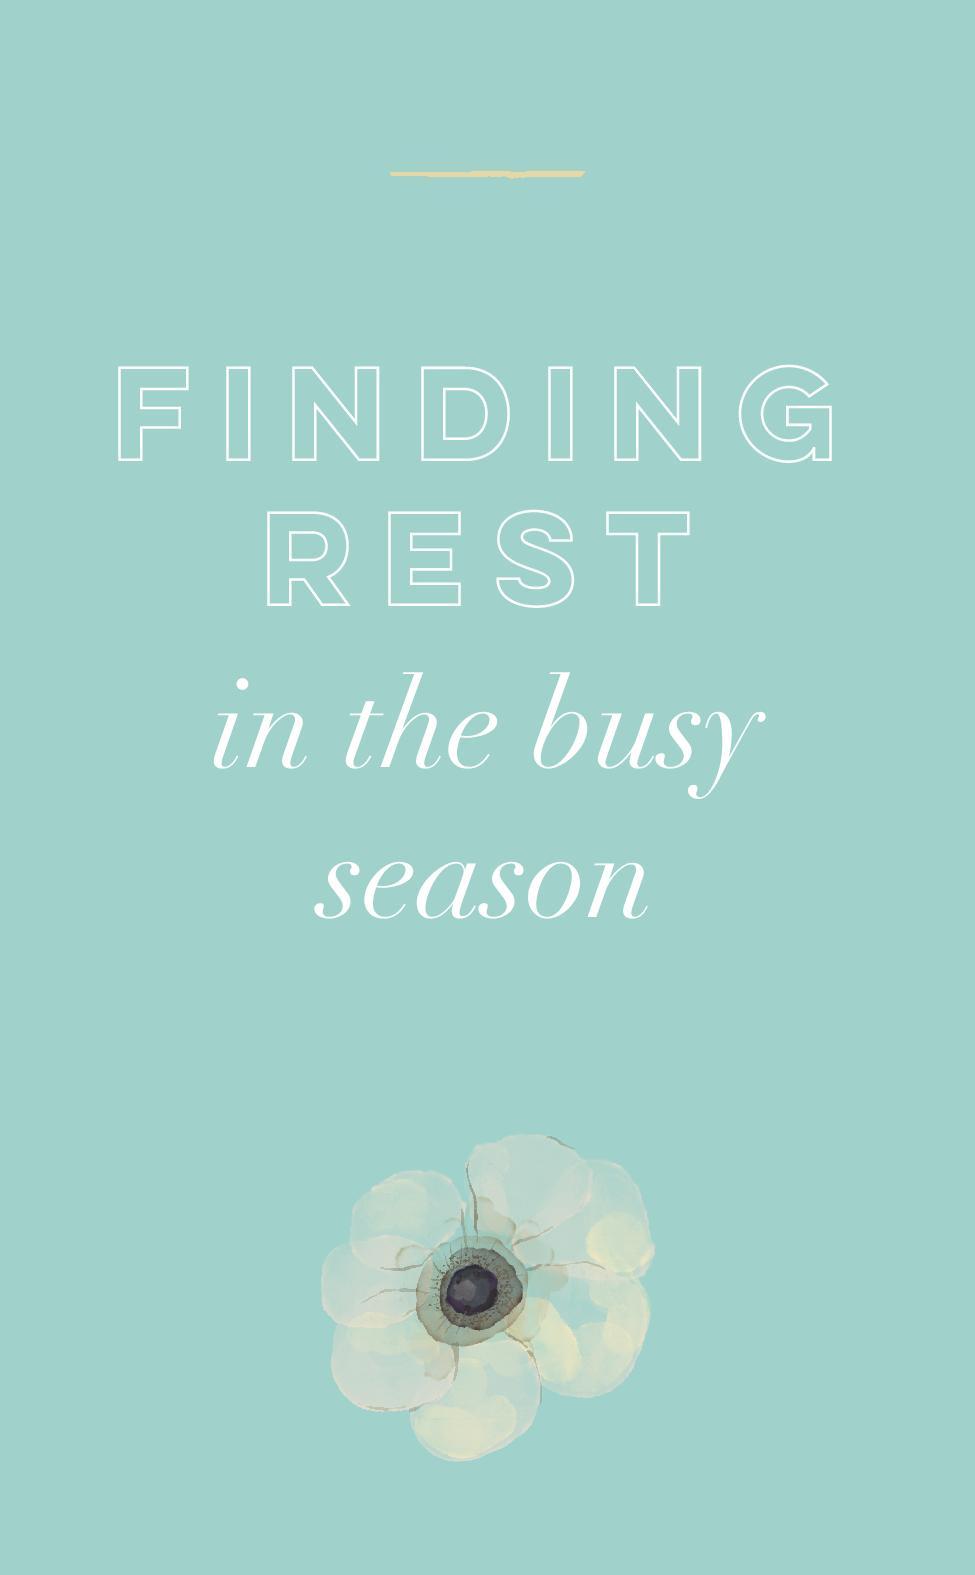 Finding Rest in the Busy Season.jpg